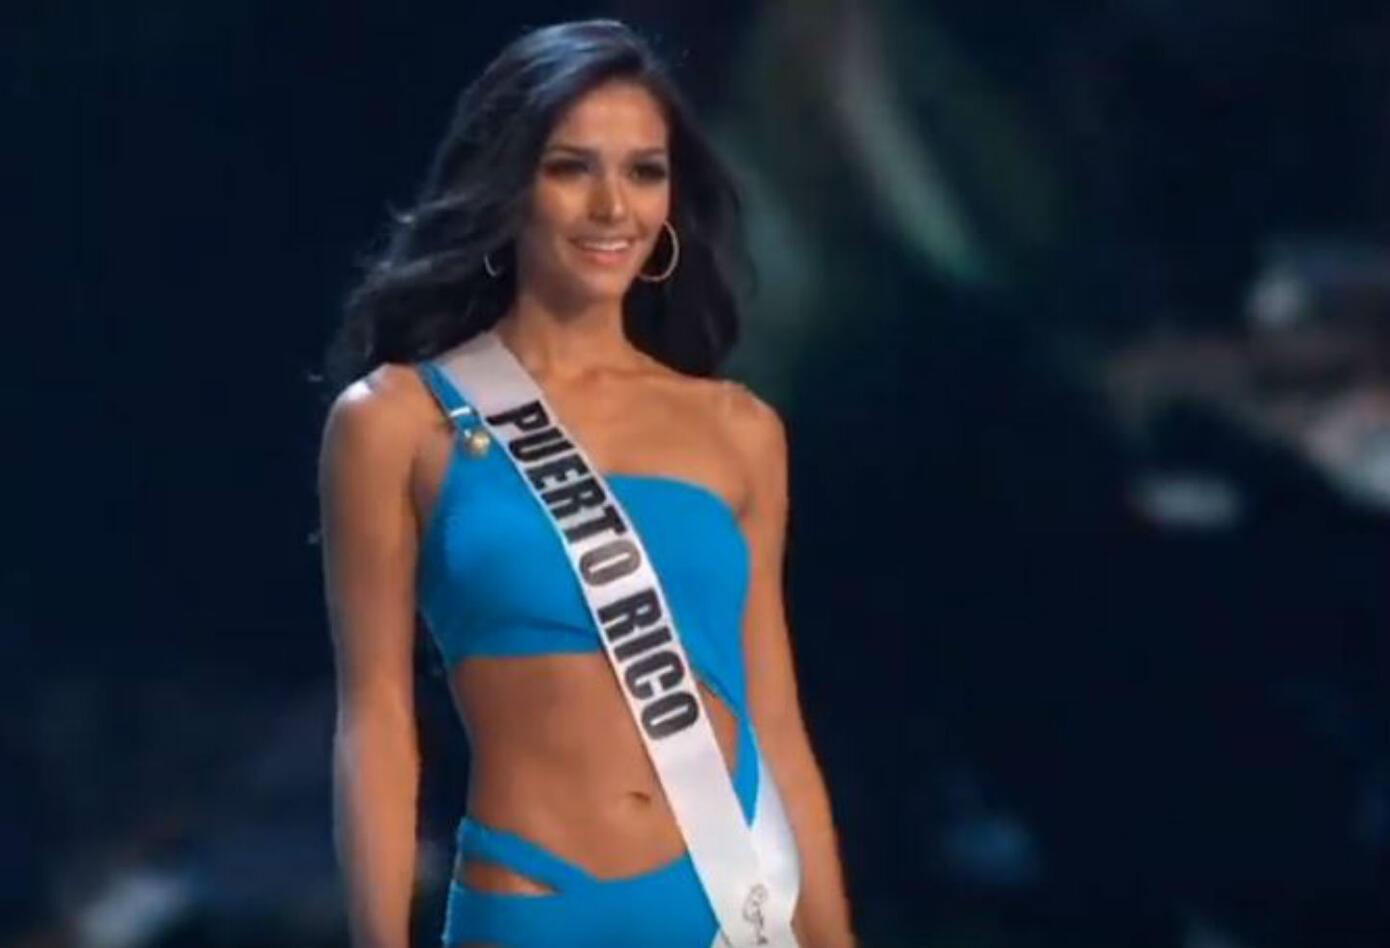 Desfile en traje de baño de Miss Puerto Rico, Kiara Ortega